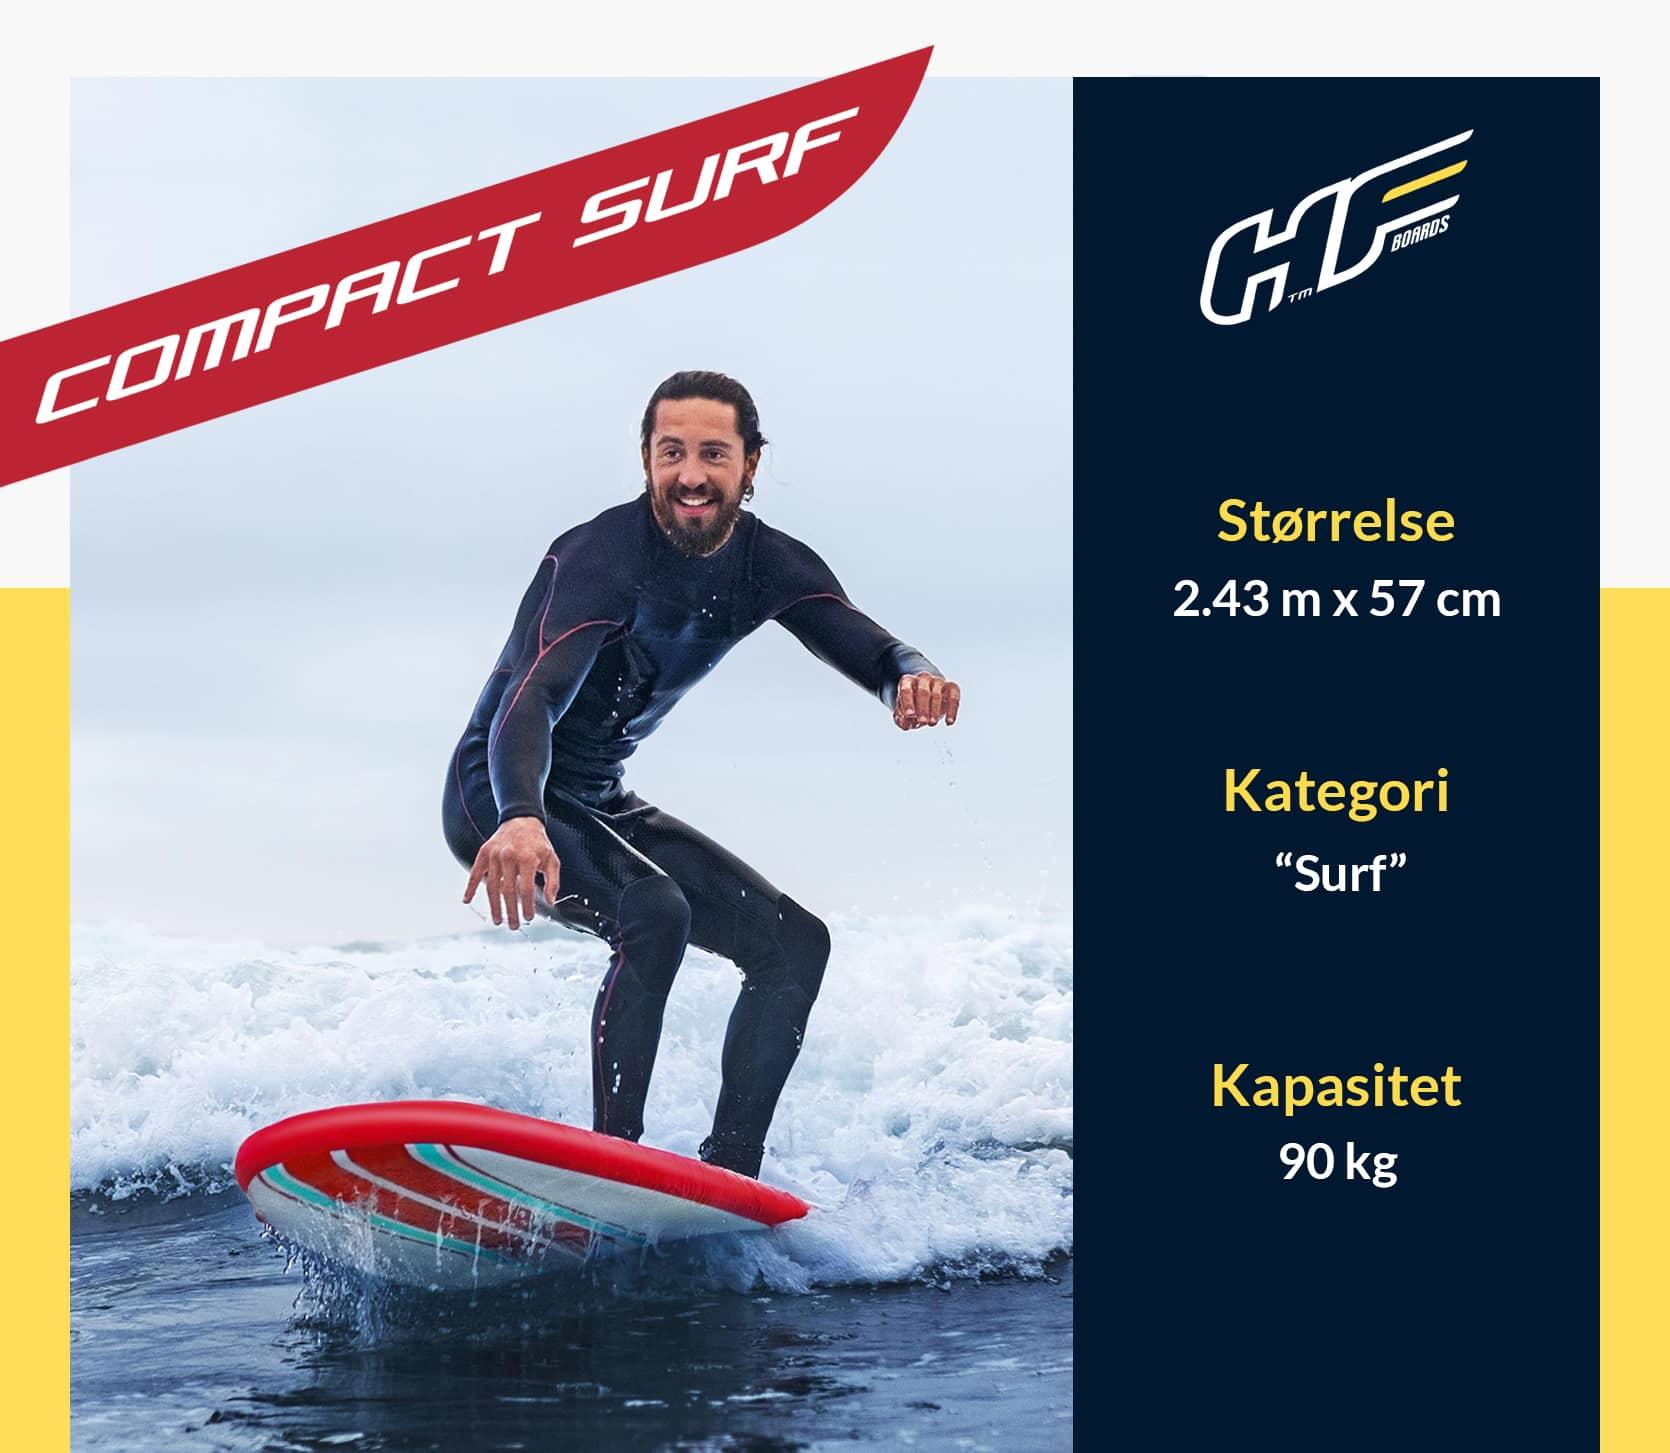 Compact Surf PaddleBoard Sup